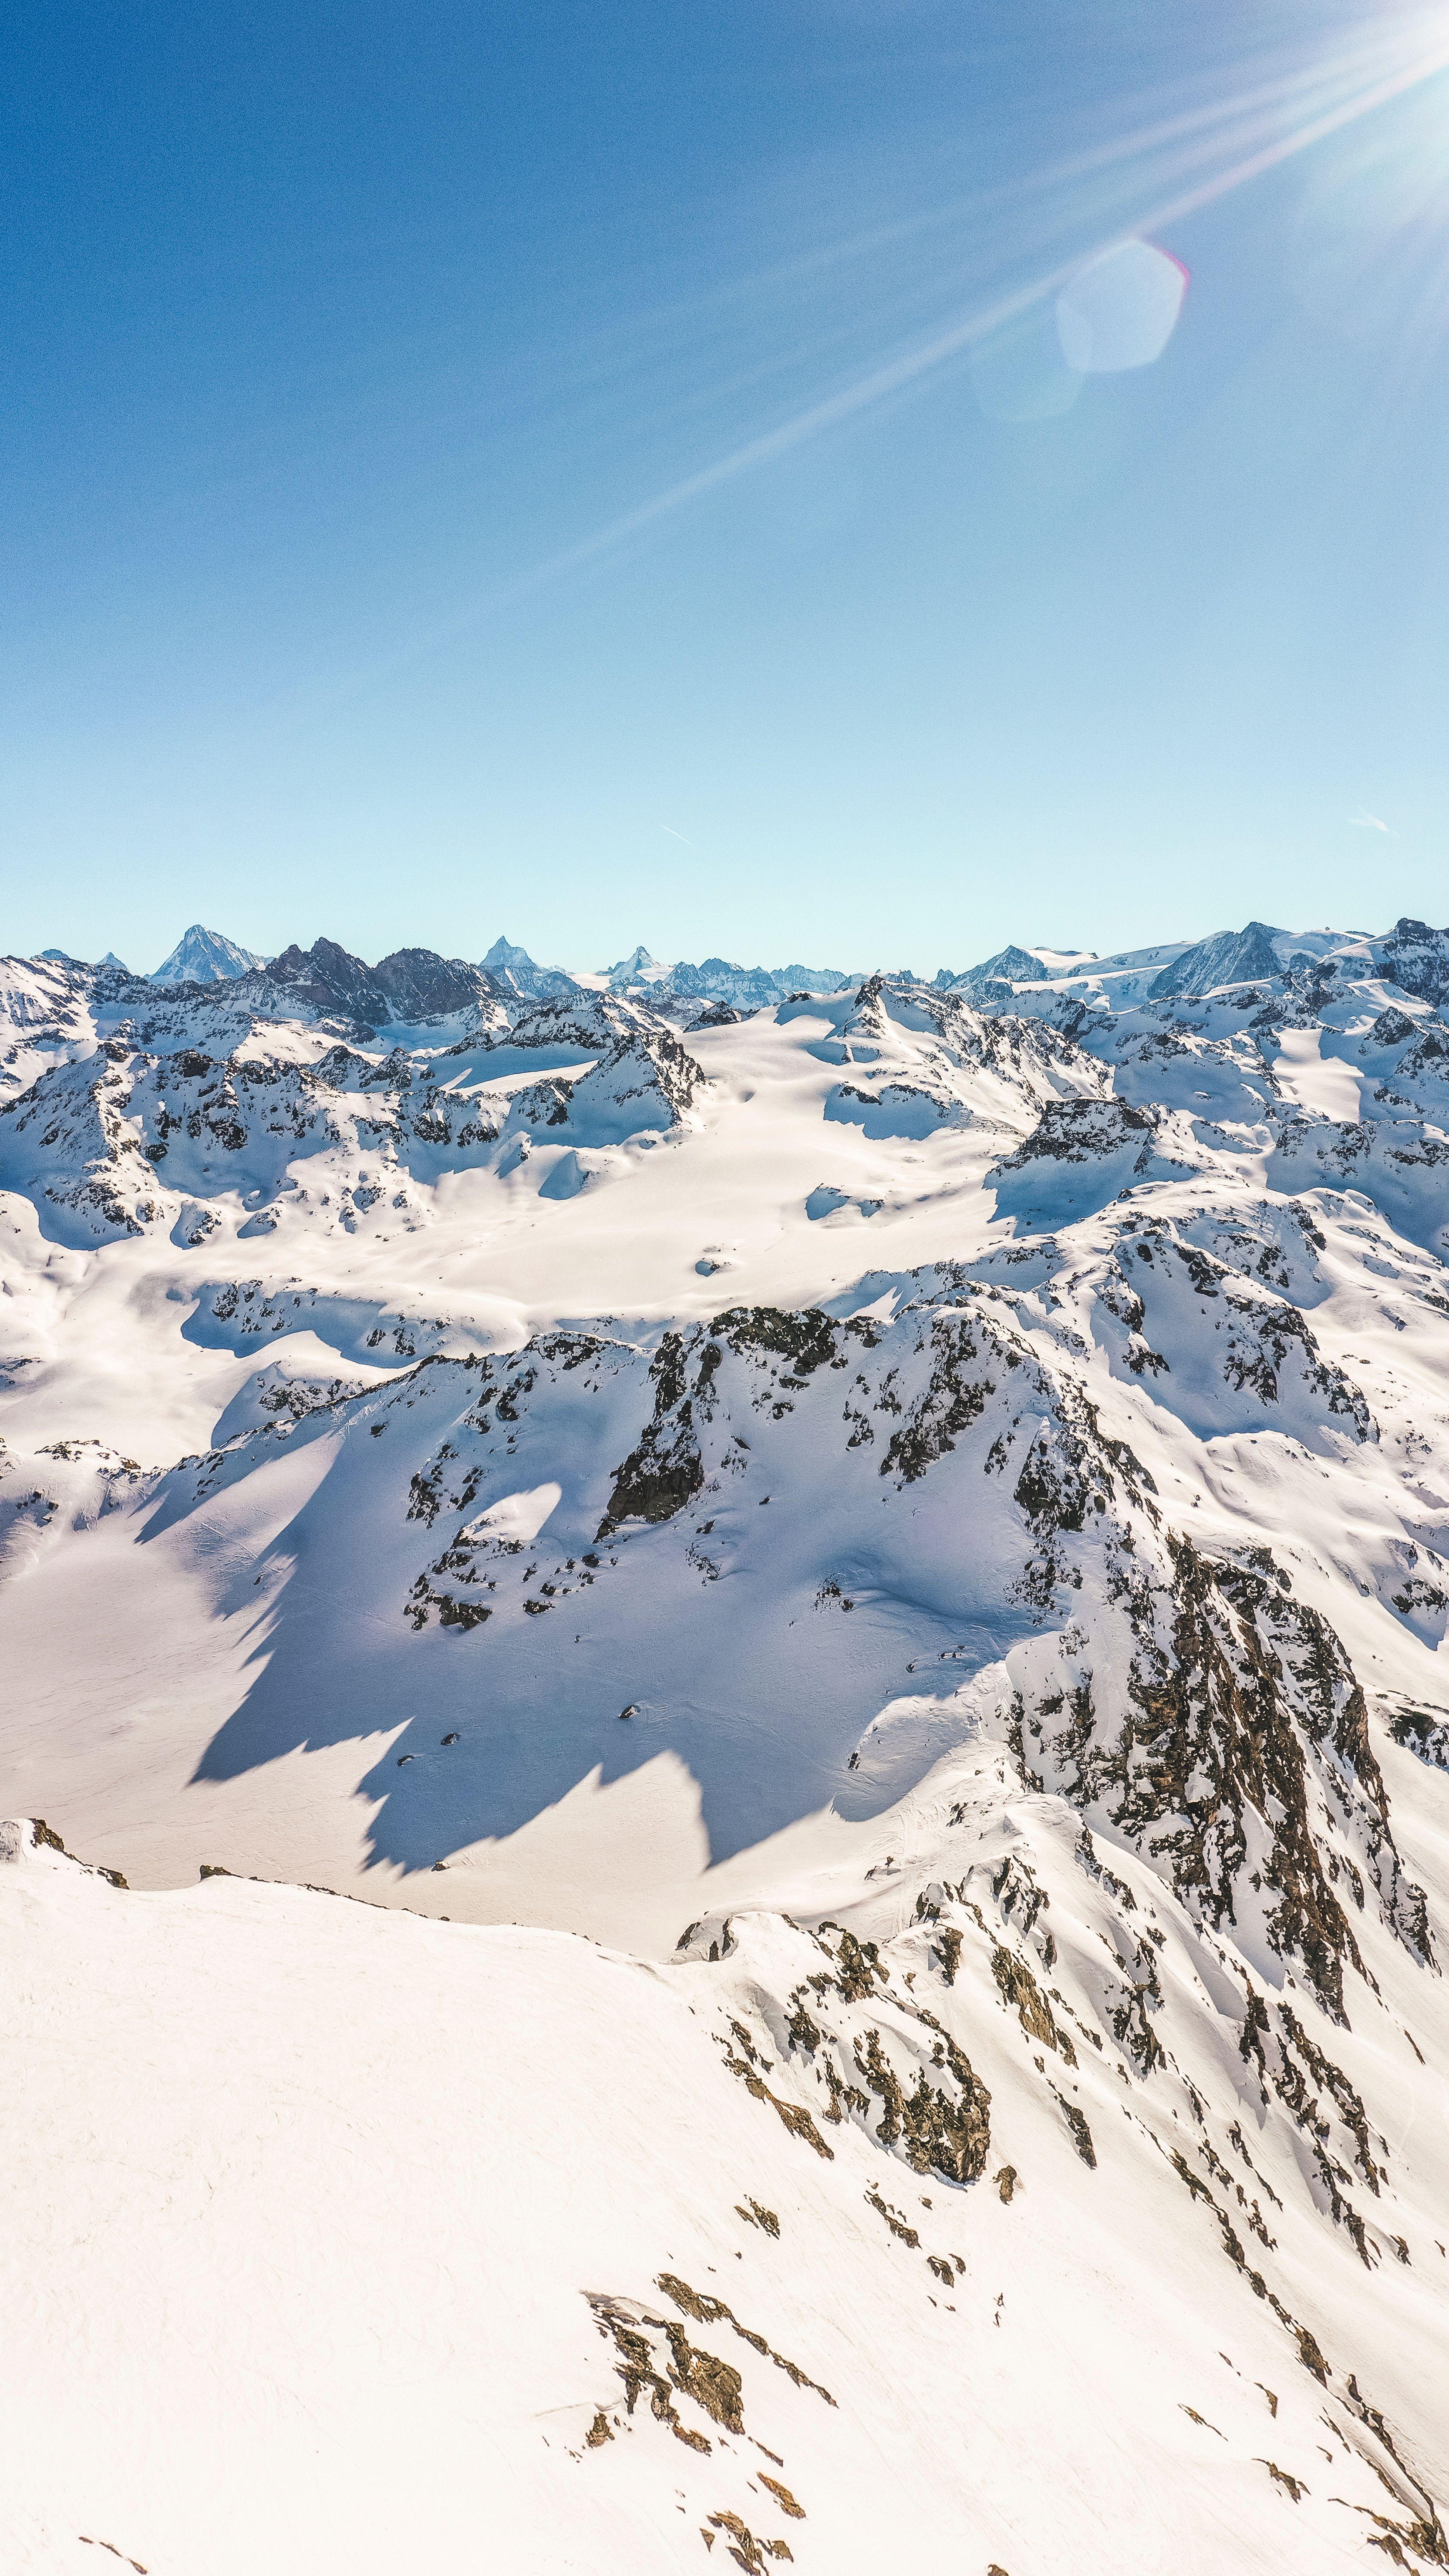 Snowy Mountain Exploring Explore Mountains Winter Landscape Mountain Photography Snowy Mountains